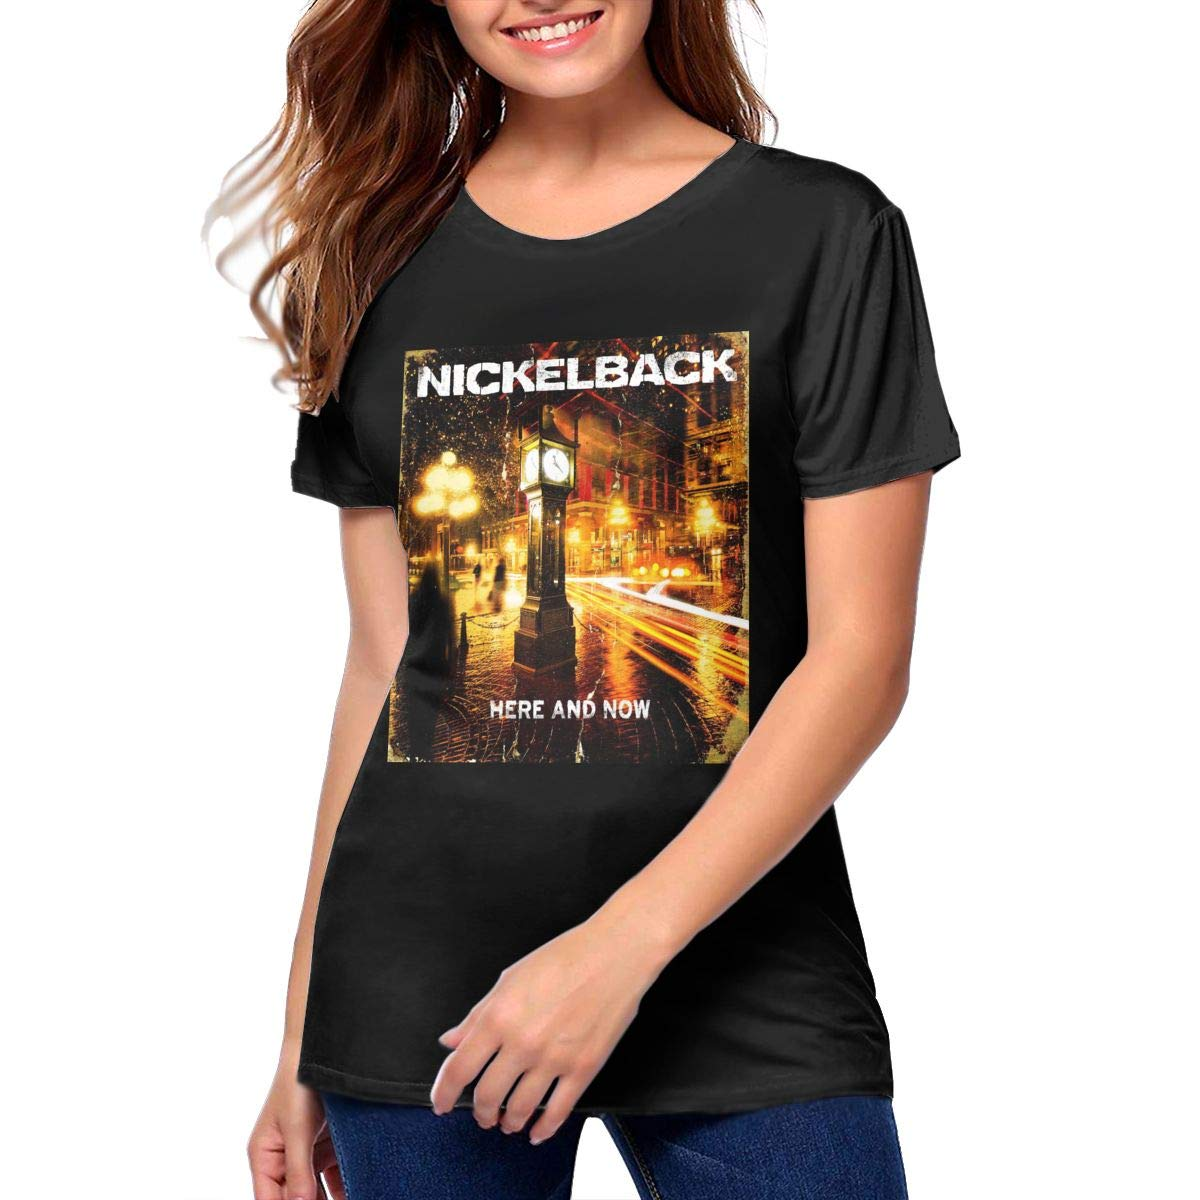 Nickelback Woman Loose Short Sleeve T Shirt